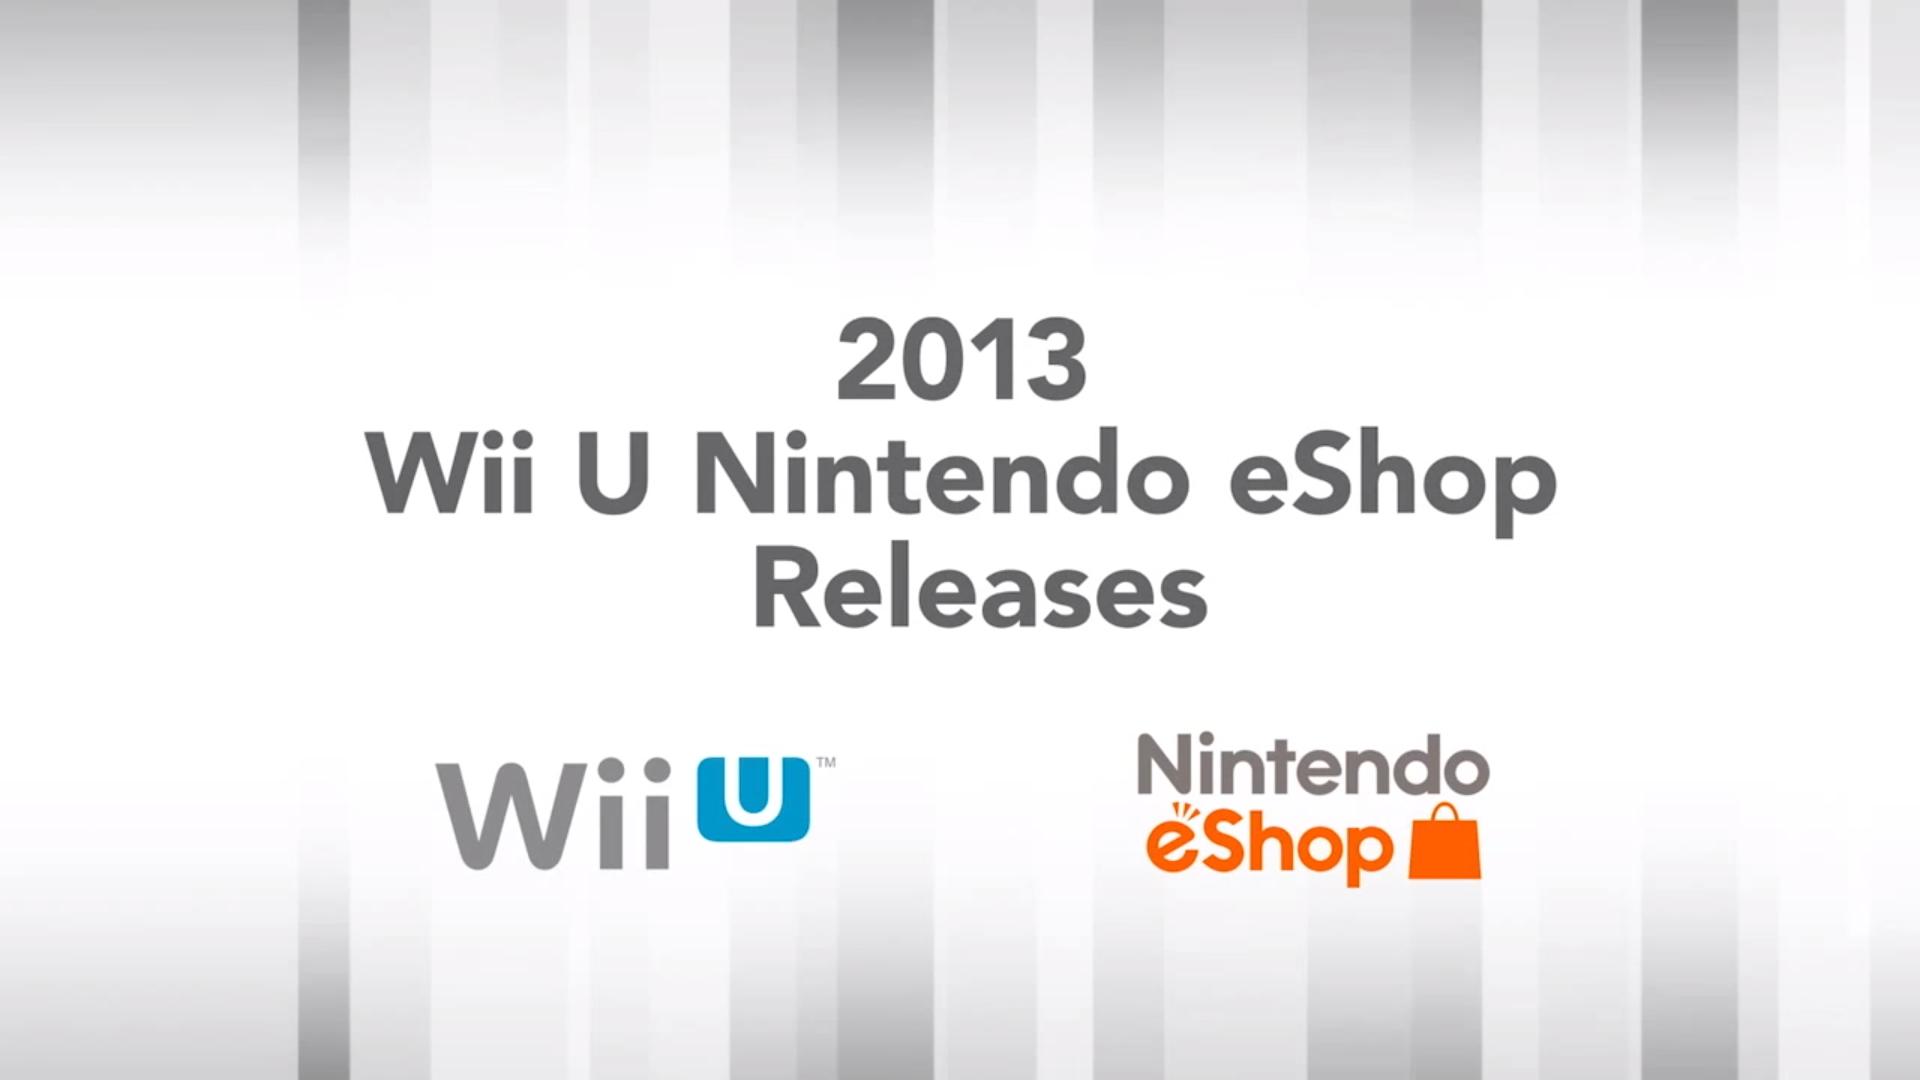 2013 Nintendo Wii U eShop Releases